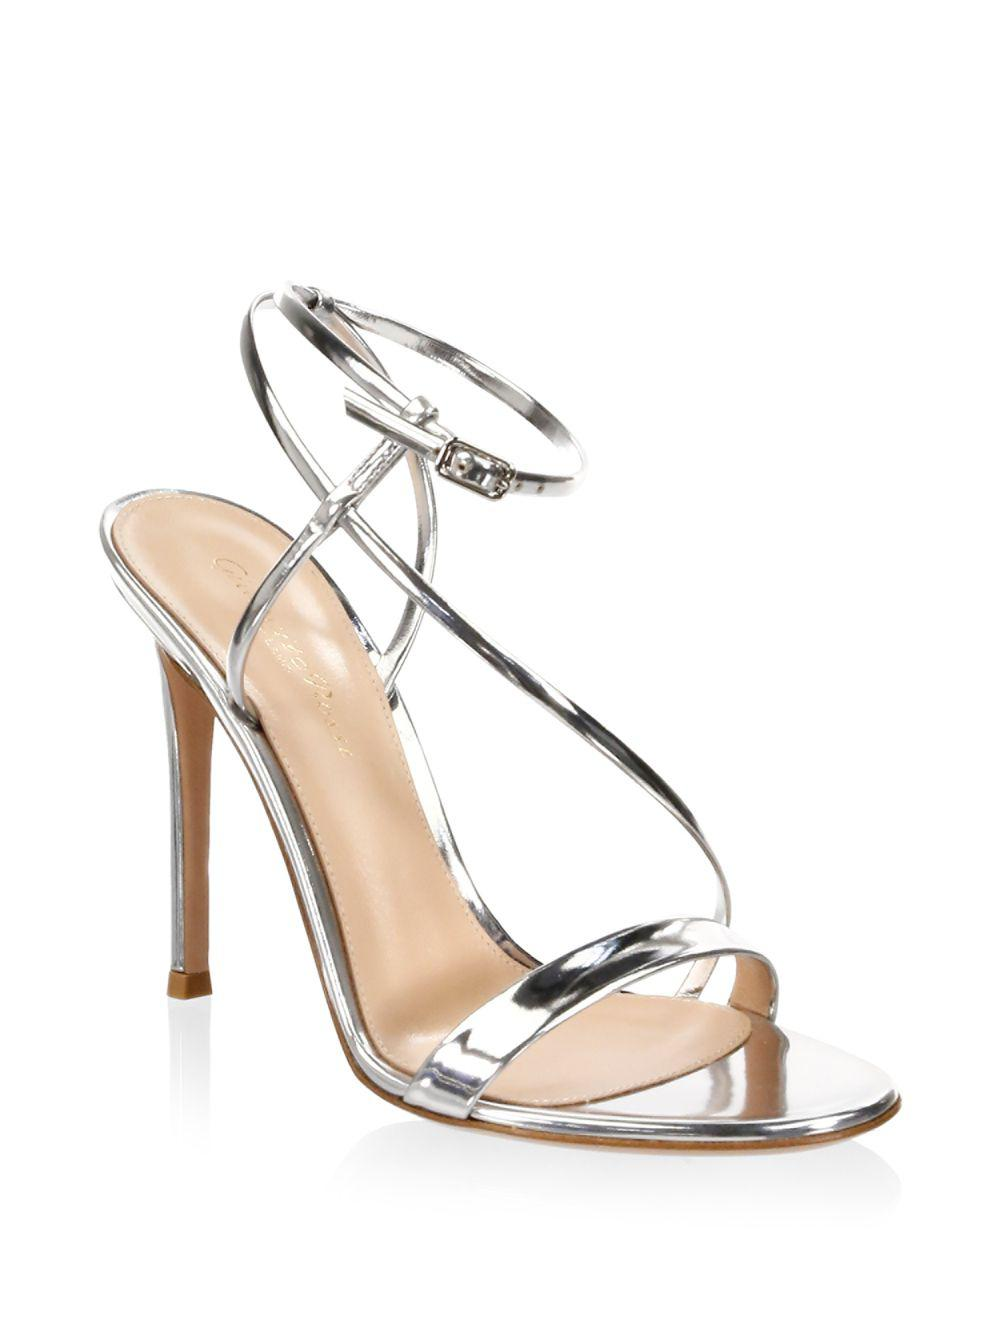 707d659c5b2 Gianvito Rossi Metallic Ankle-strap Sandals in Metallic - Save 29 ...